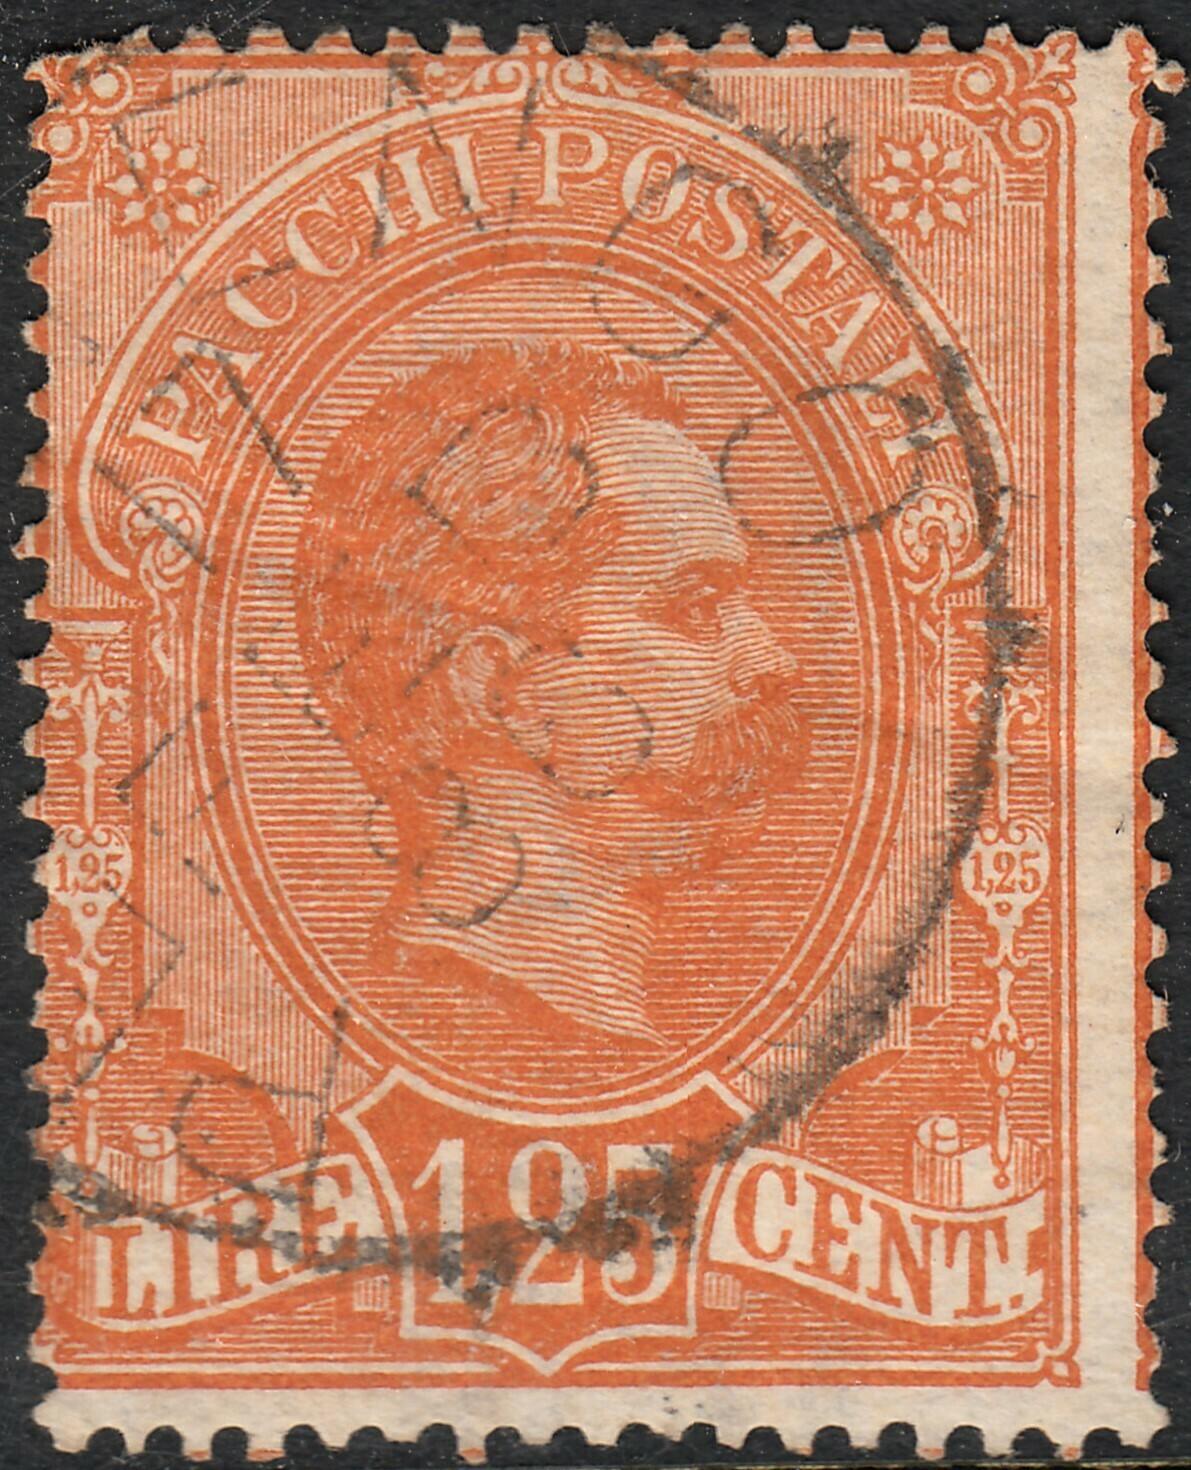 Italy 1884 1l25 Orange Parcel Post VFU